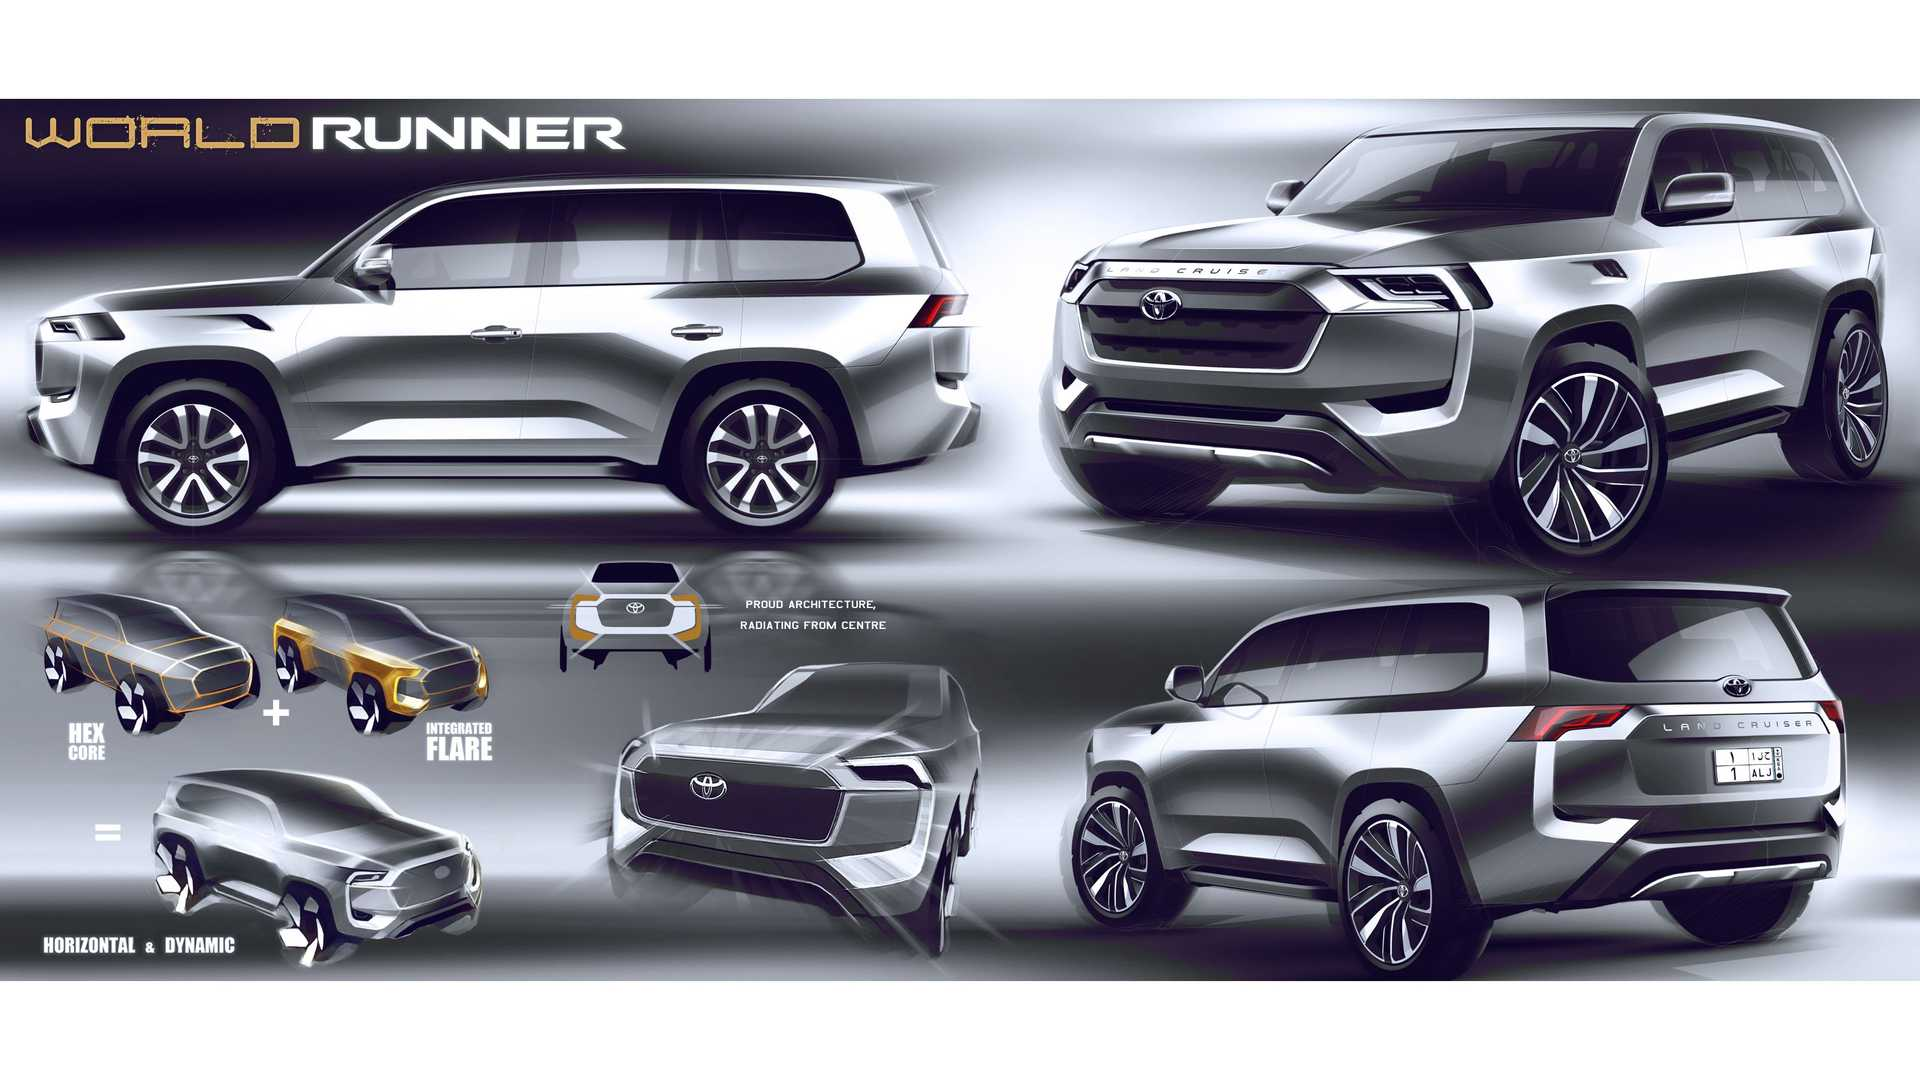 2022 Toyota Land Cruiser design sketches